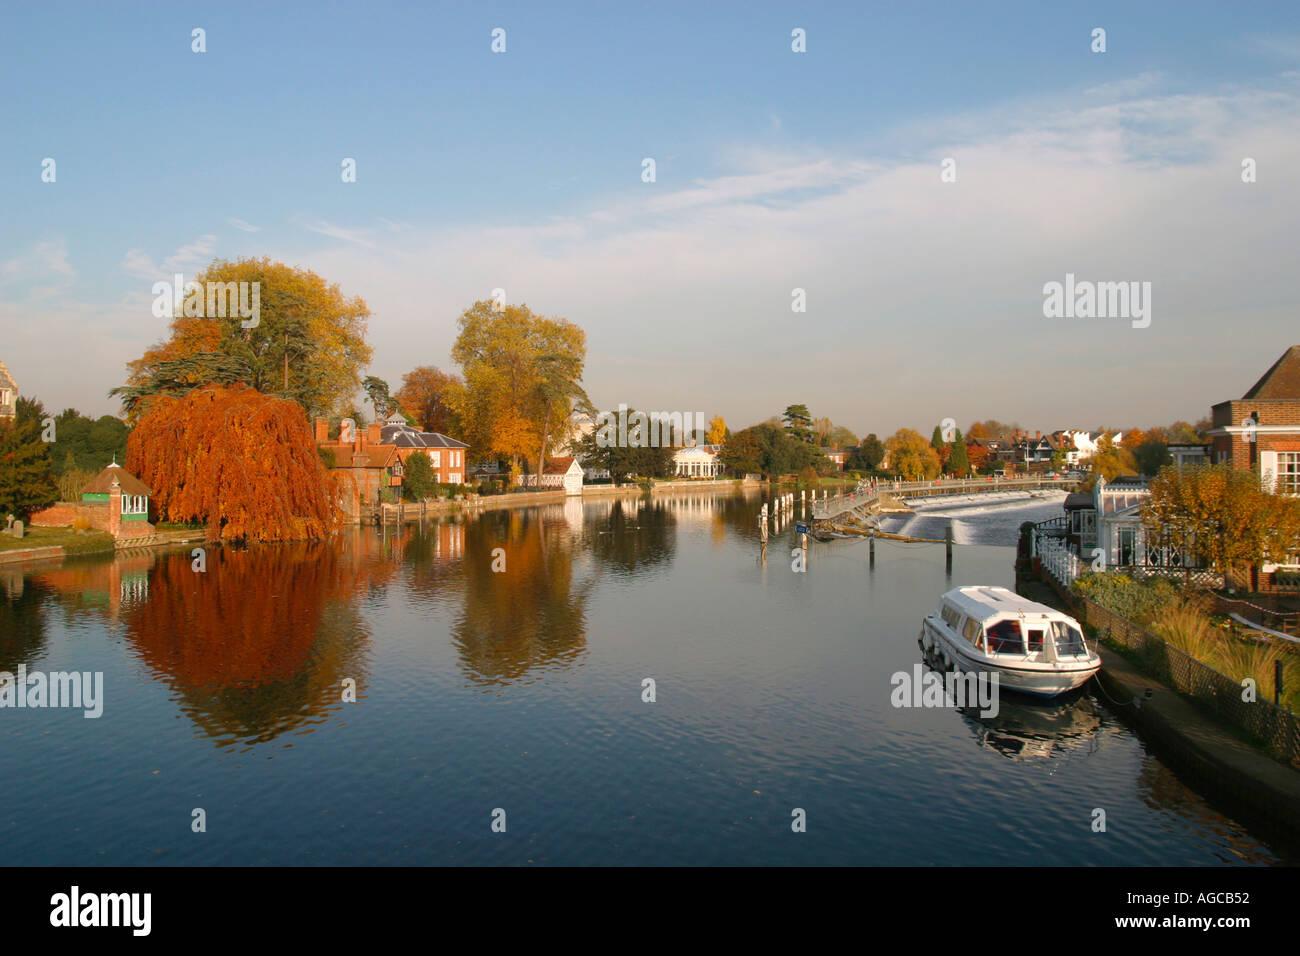 Autumn colour, River Thames, Buckinghamshire, Chilterns, England, UK, Europe - Stock Image